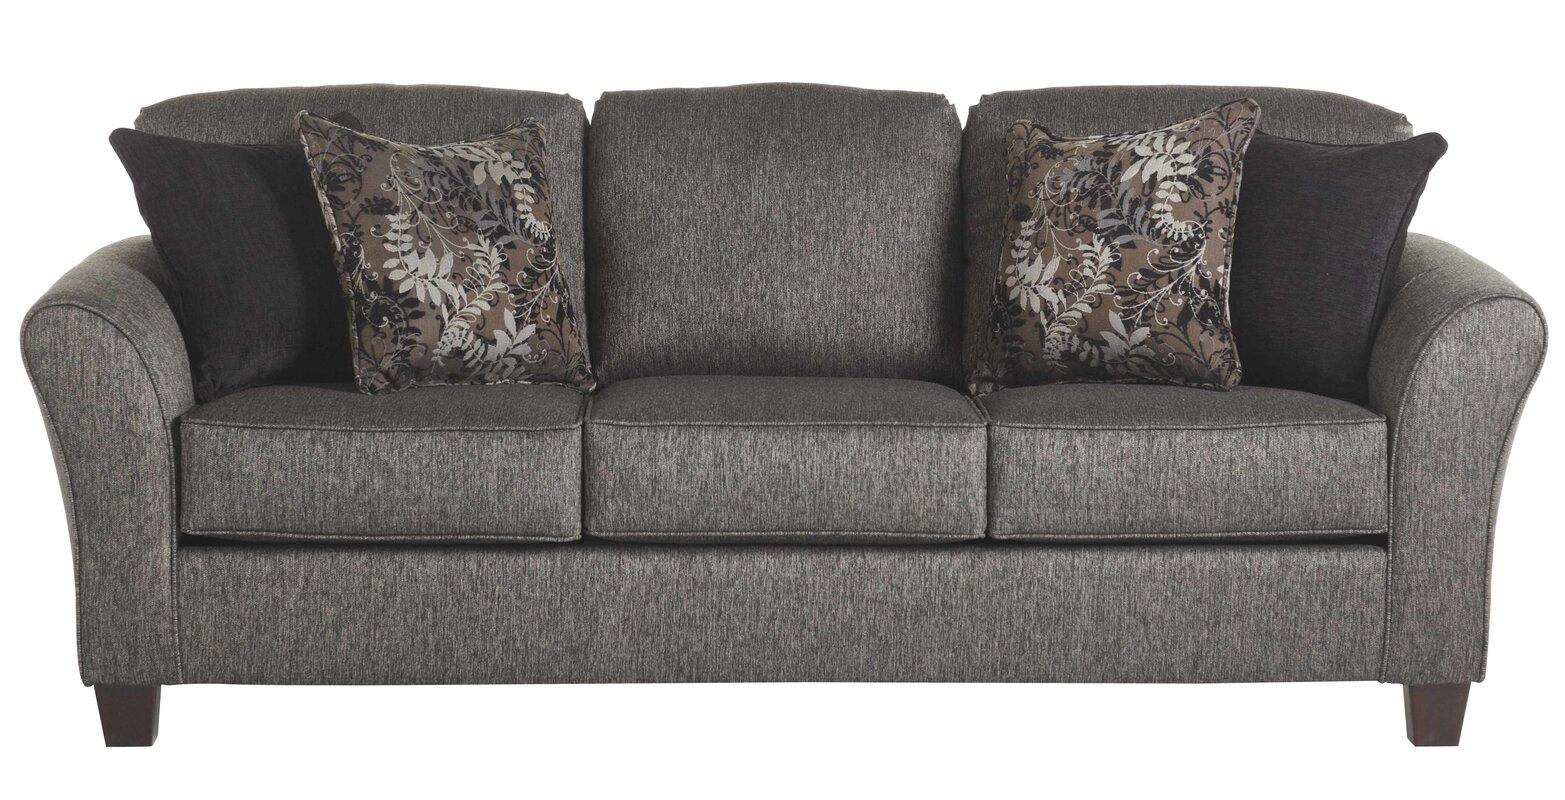 Serta Upholstery Sofa Sofas Awesome Serta Sofa To Go